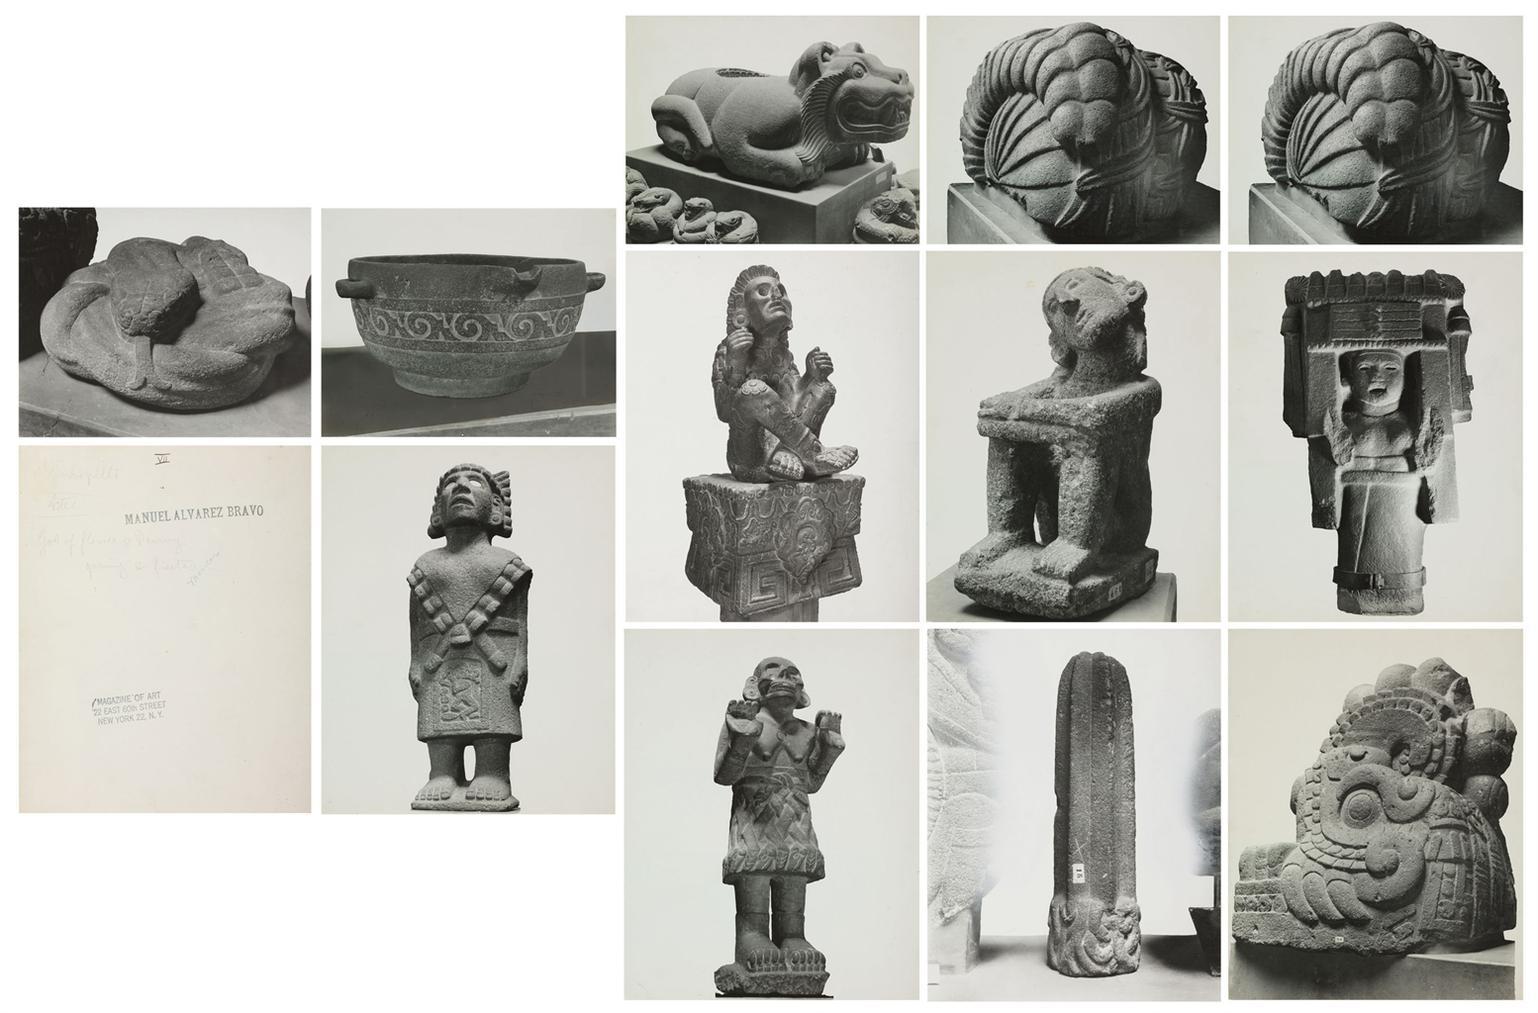 Manuel Alvarez Bravo-Aztec Artifacts, 1930S-1940s-